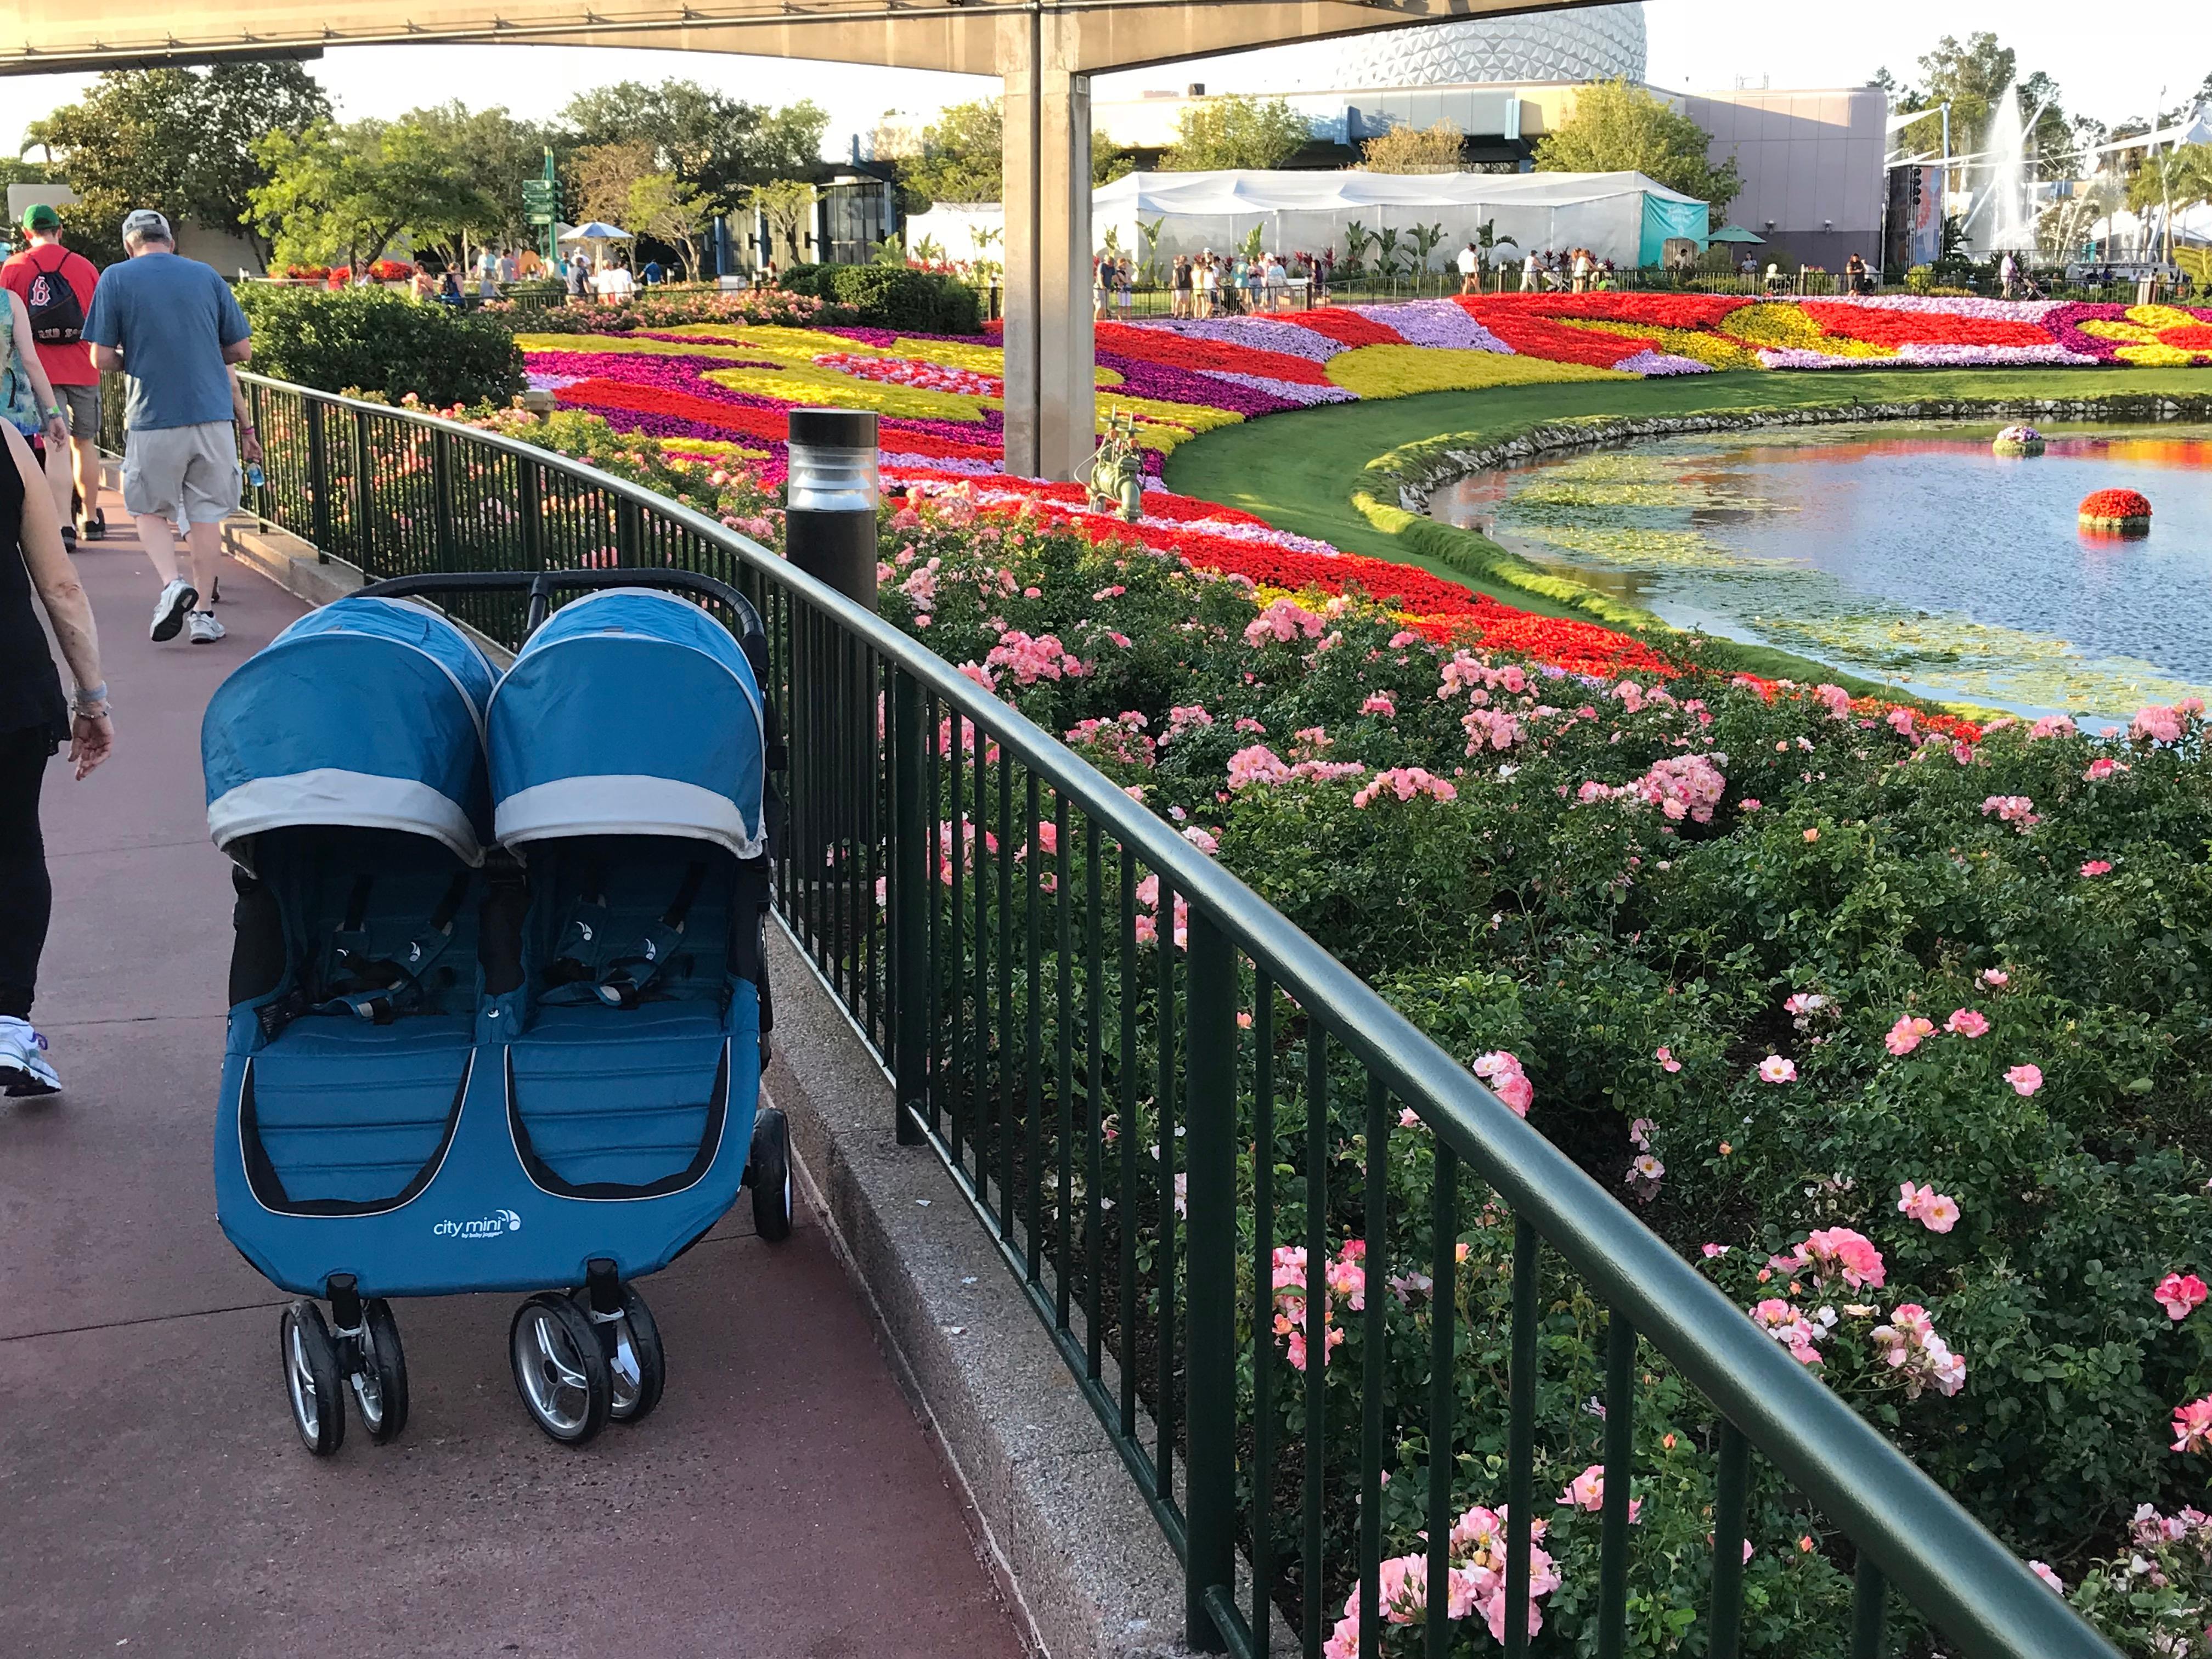 Stroller Rentals Disney image 31